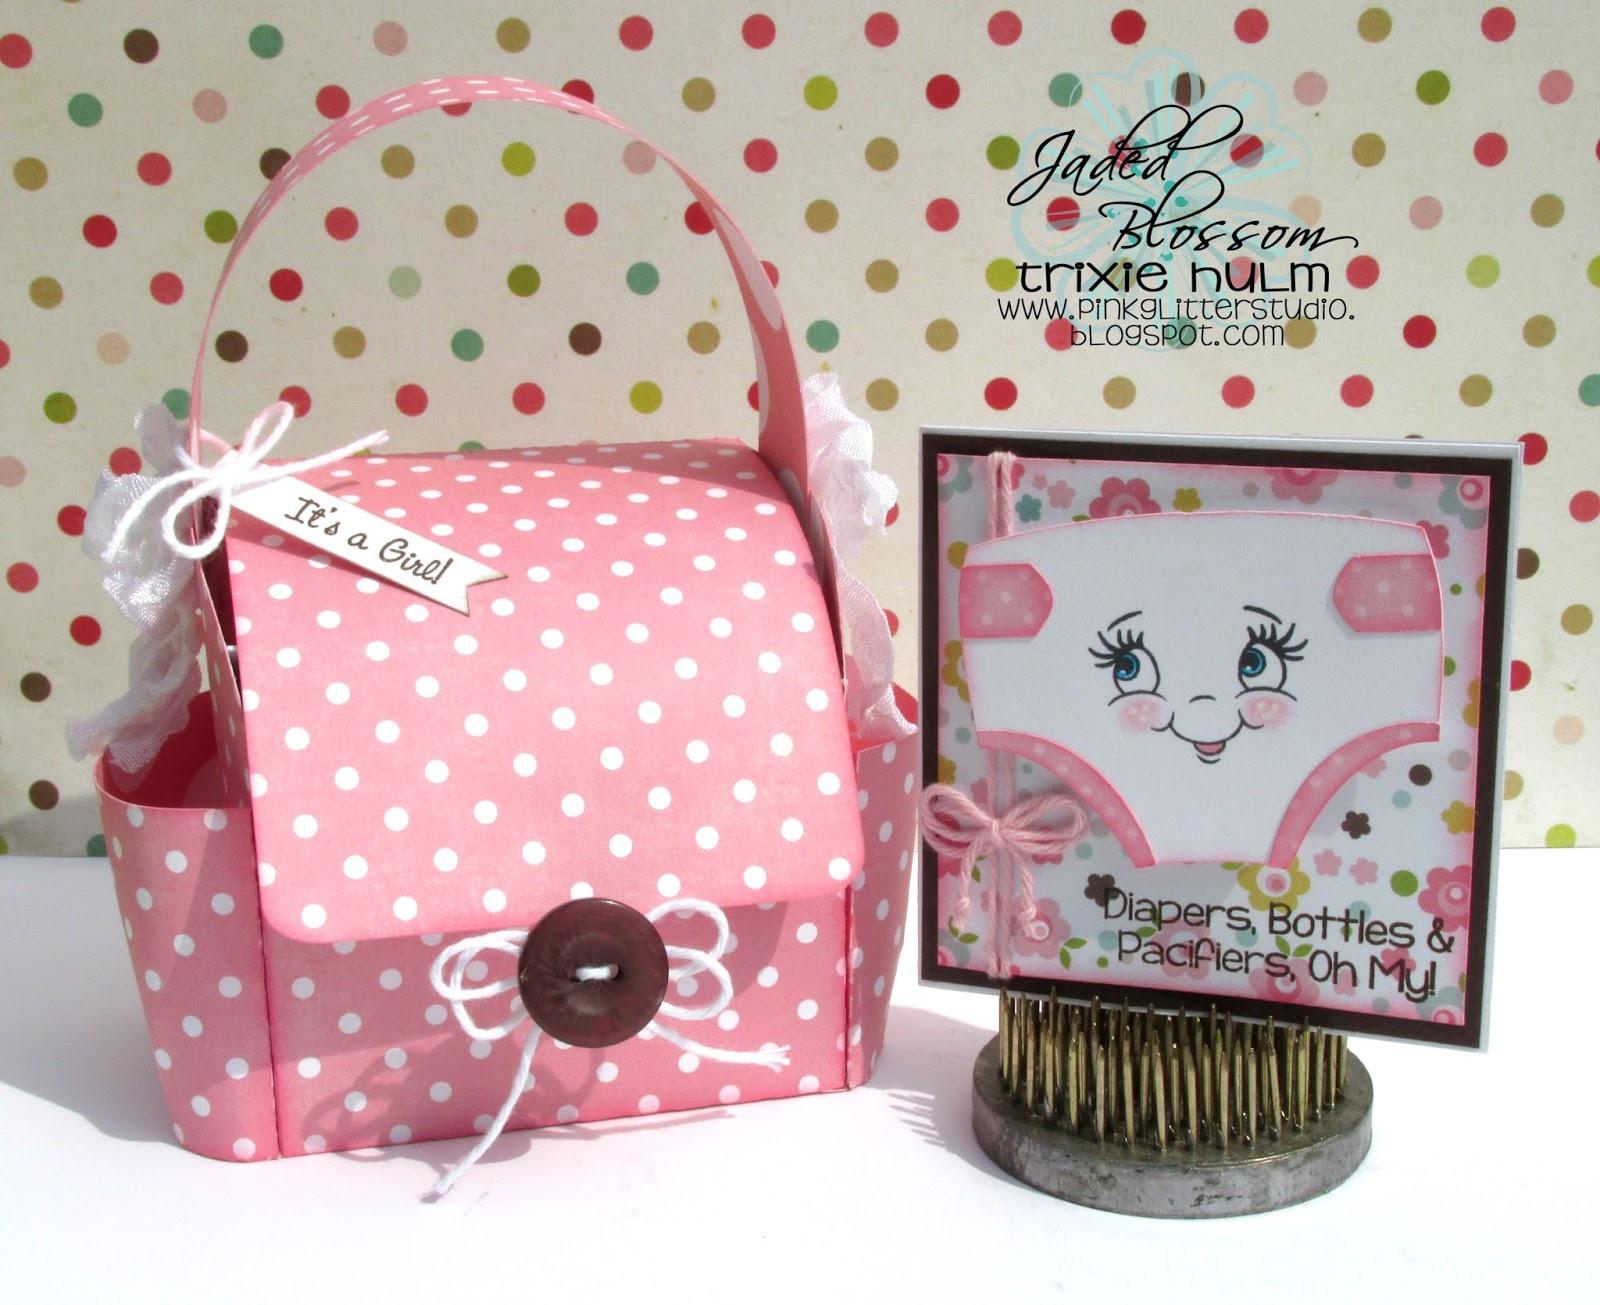 Pink Glitter Studio Jaded Blossom August Stamp Release